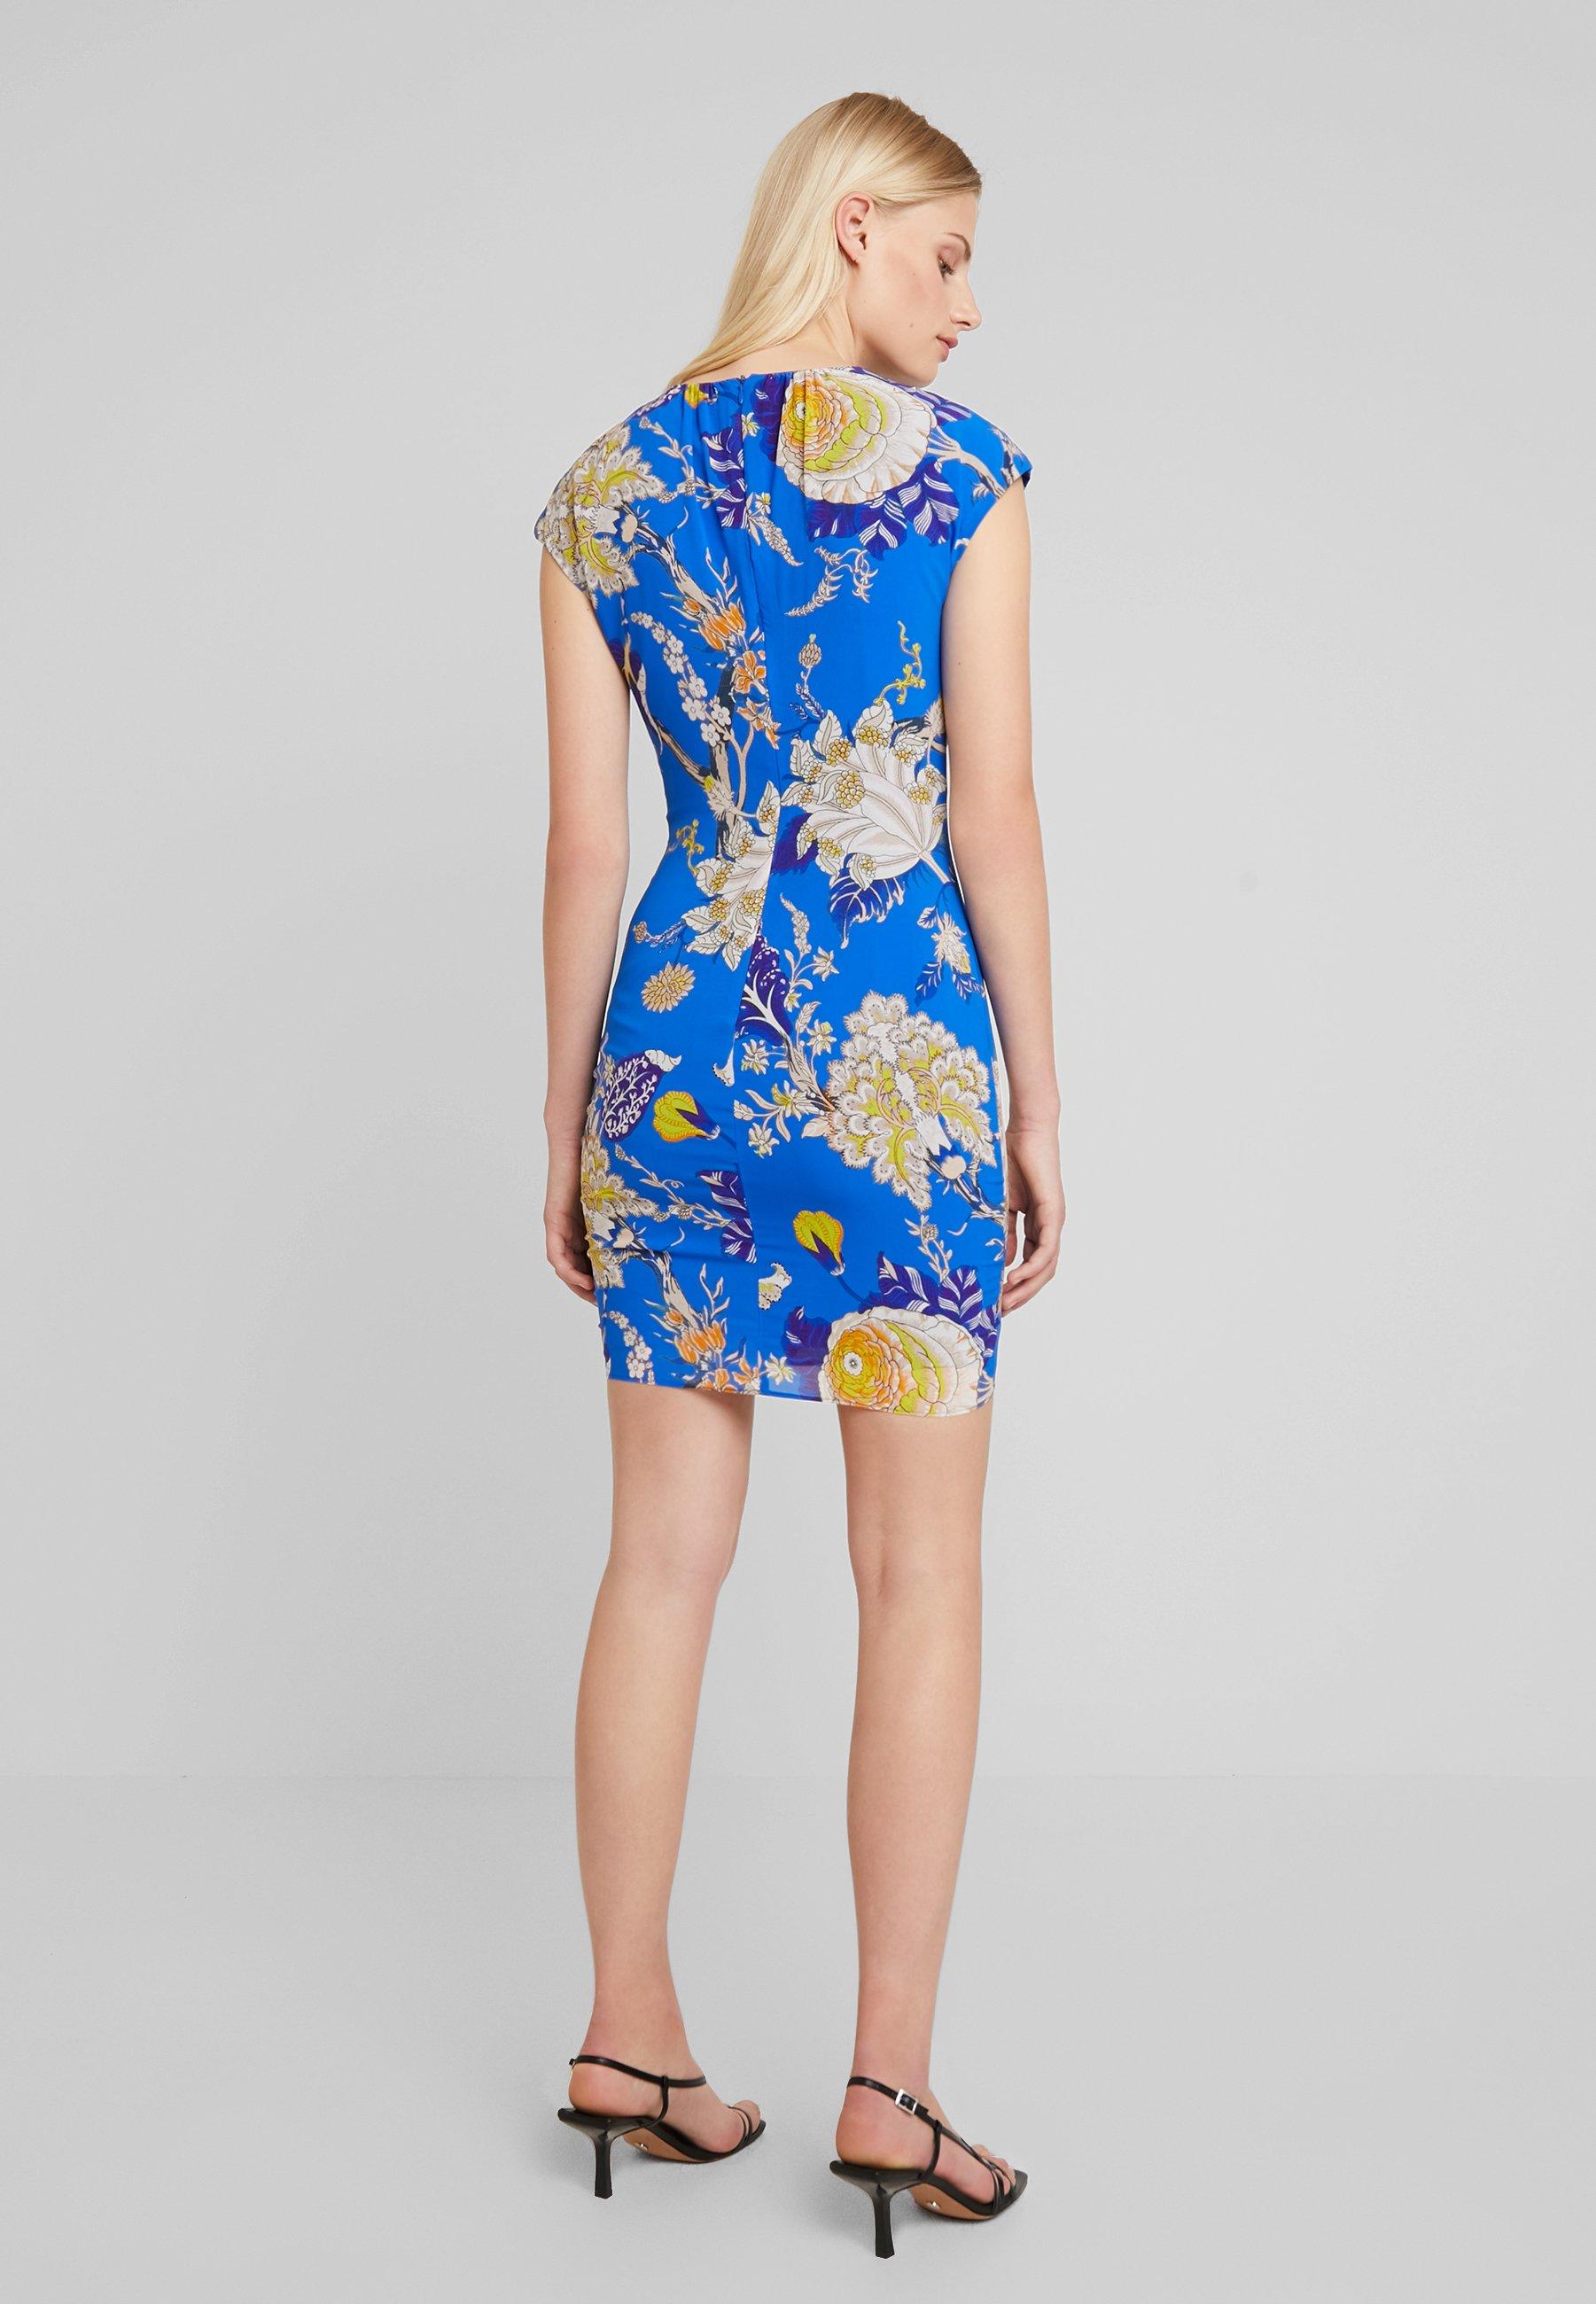 Bodycon Blue multi De Exotic Floral Whistles DressRobe Soirée nPk8OX0w